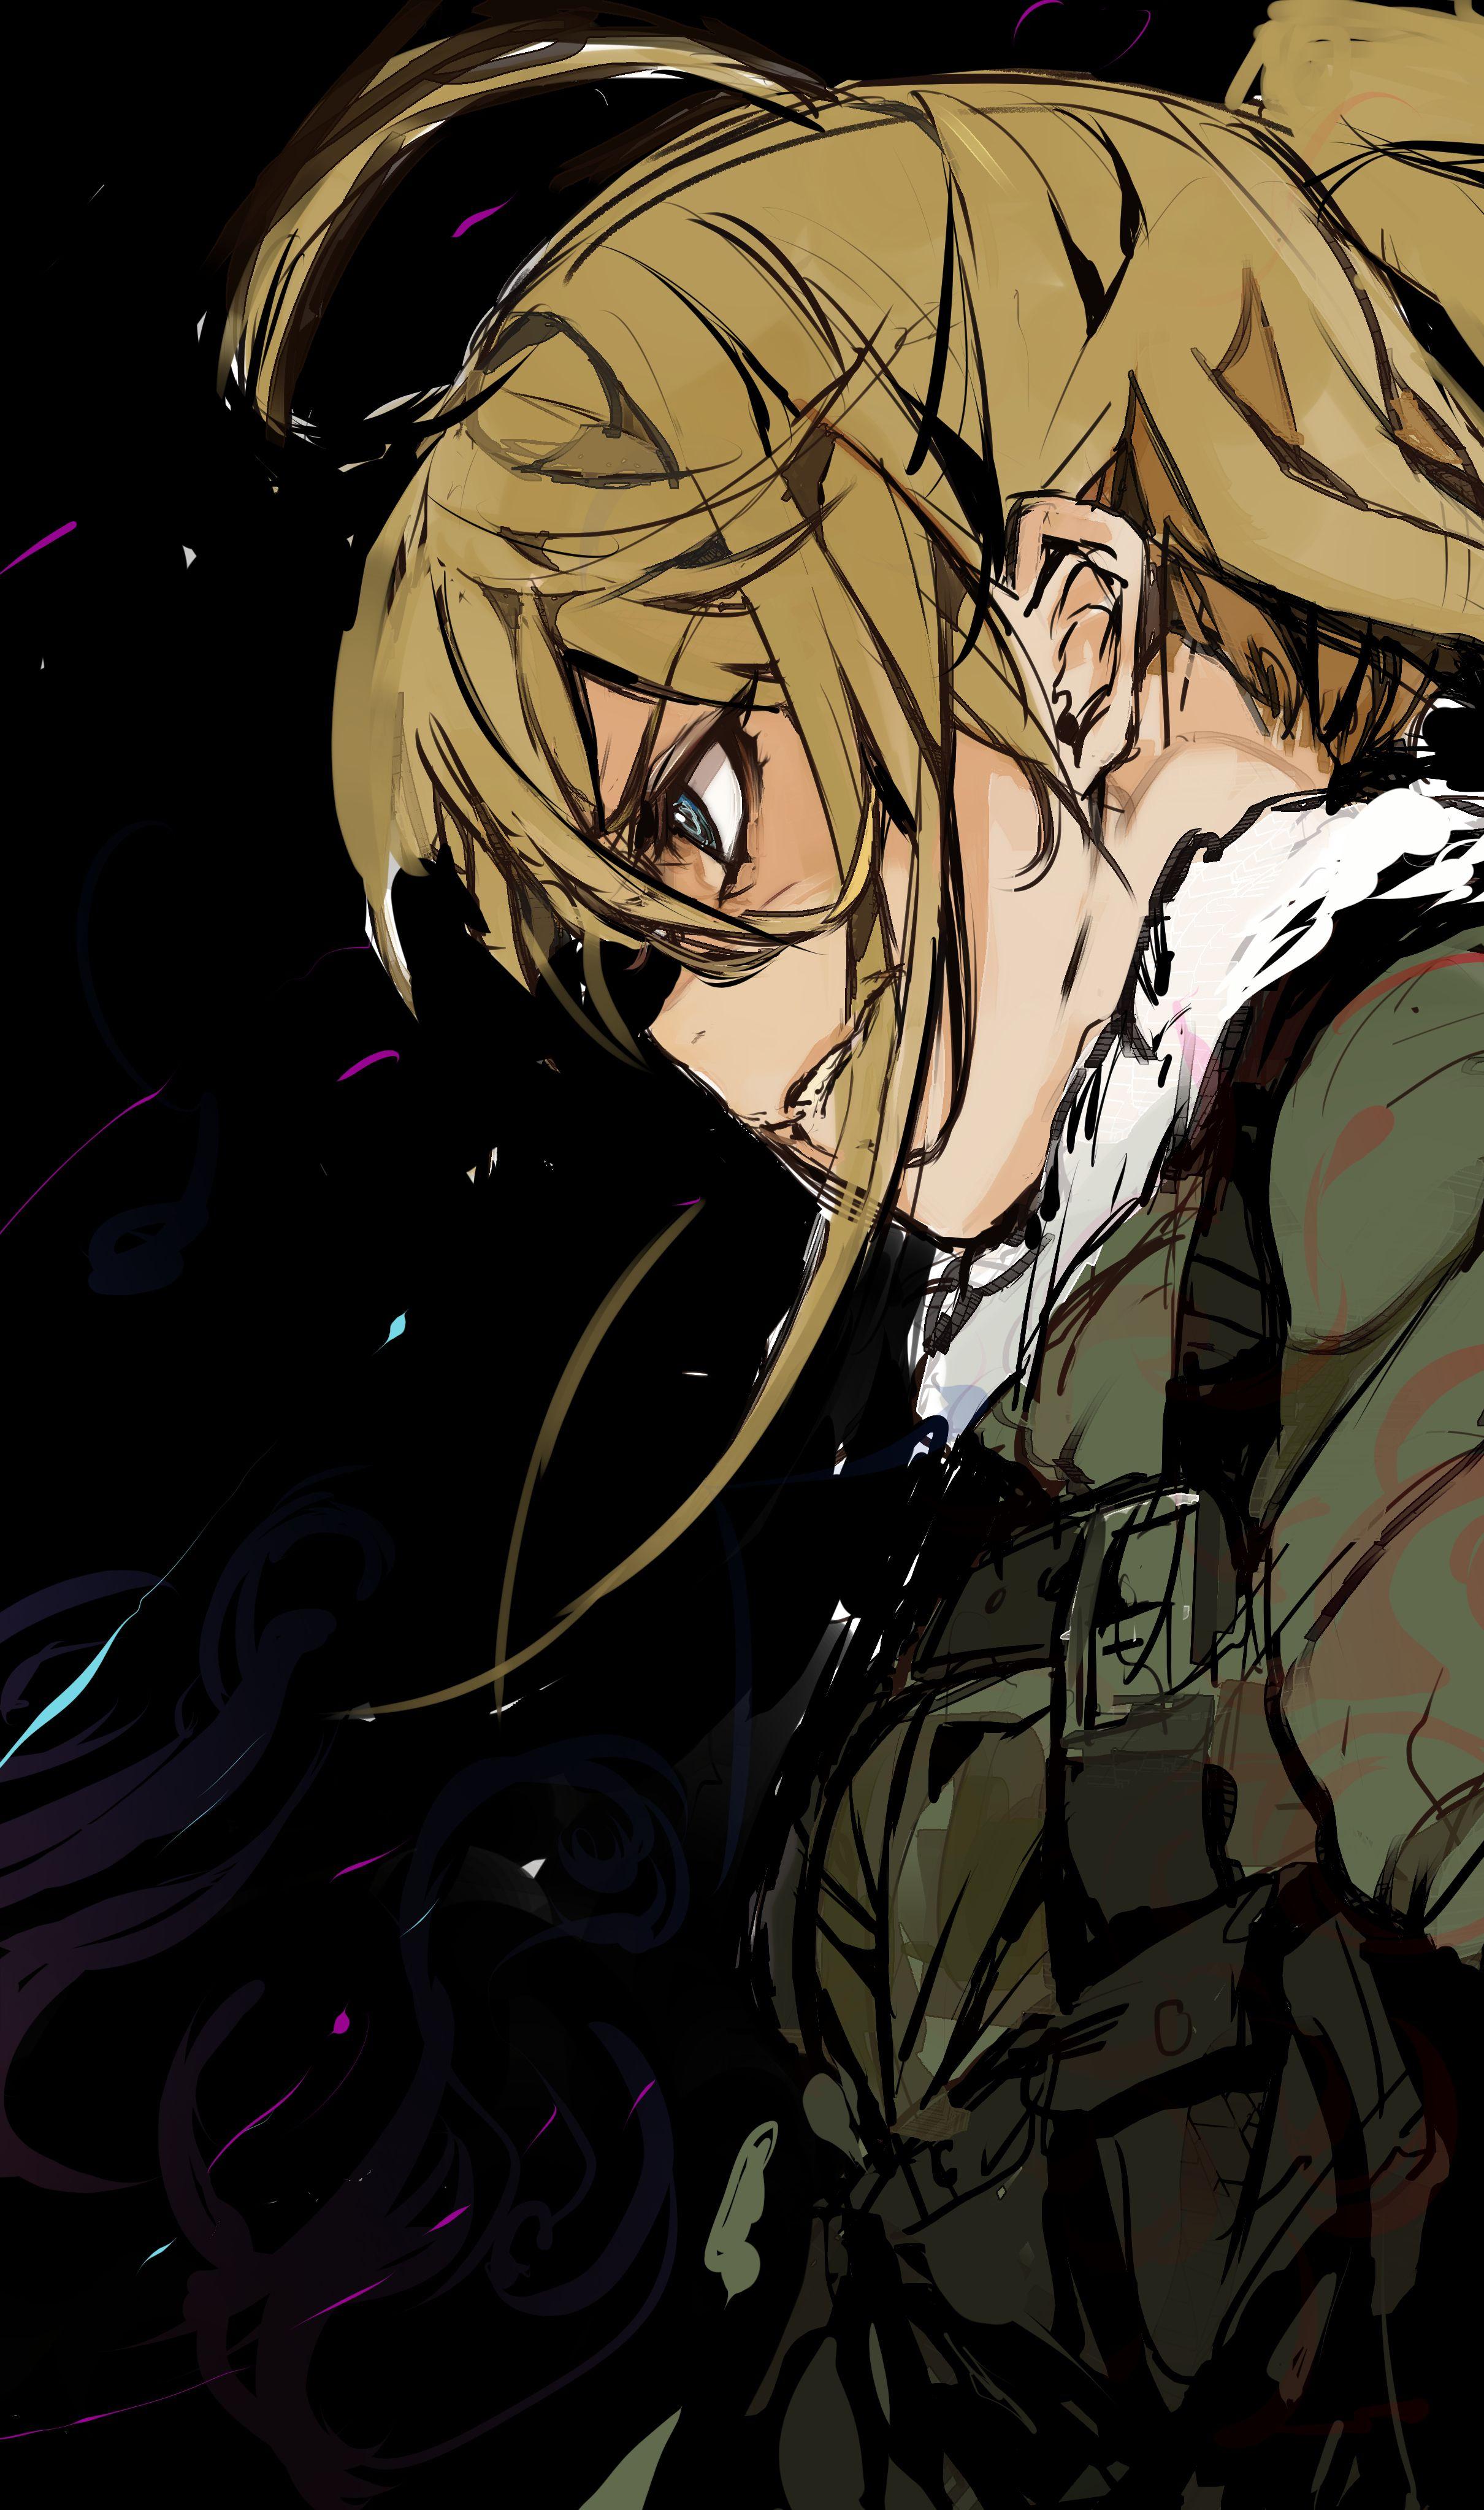 Tanya degurechaff saga of tanya the evil animegirl anime manga plusultra